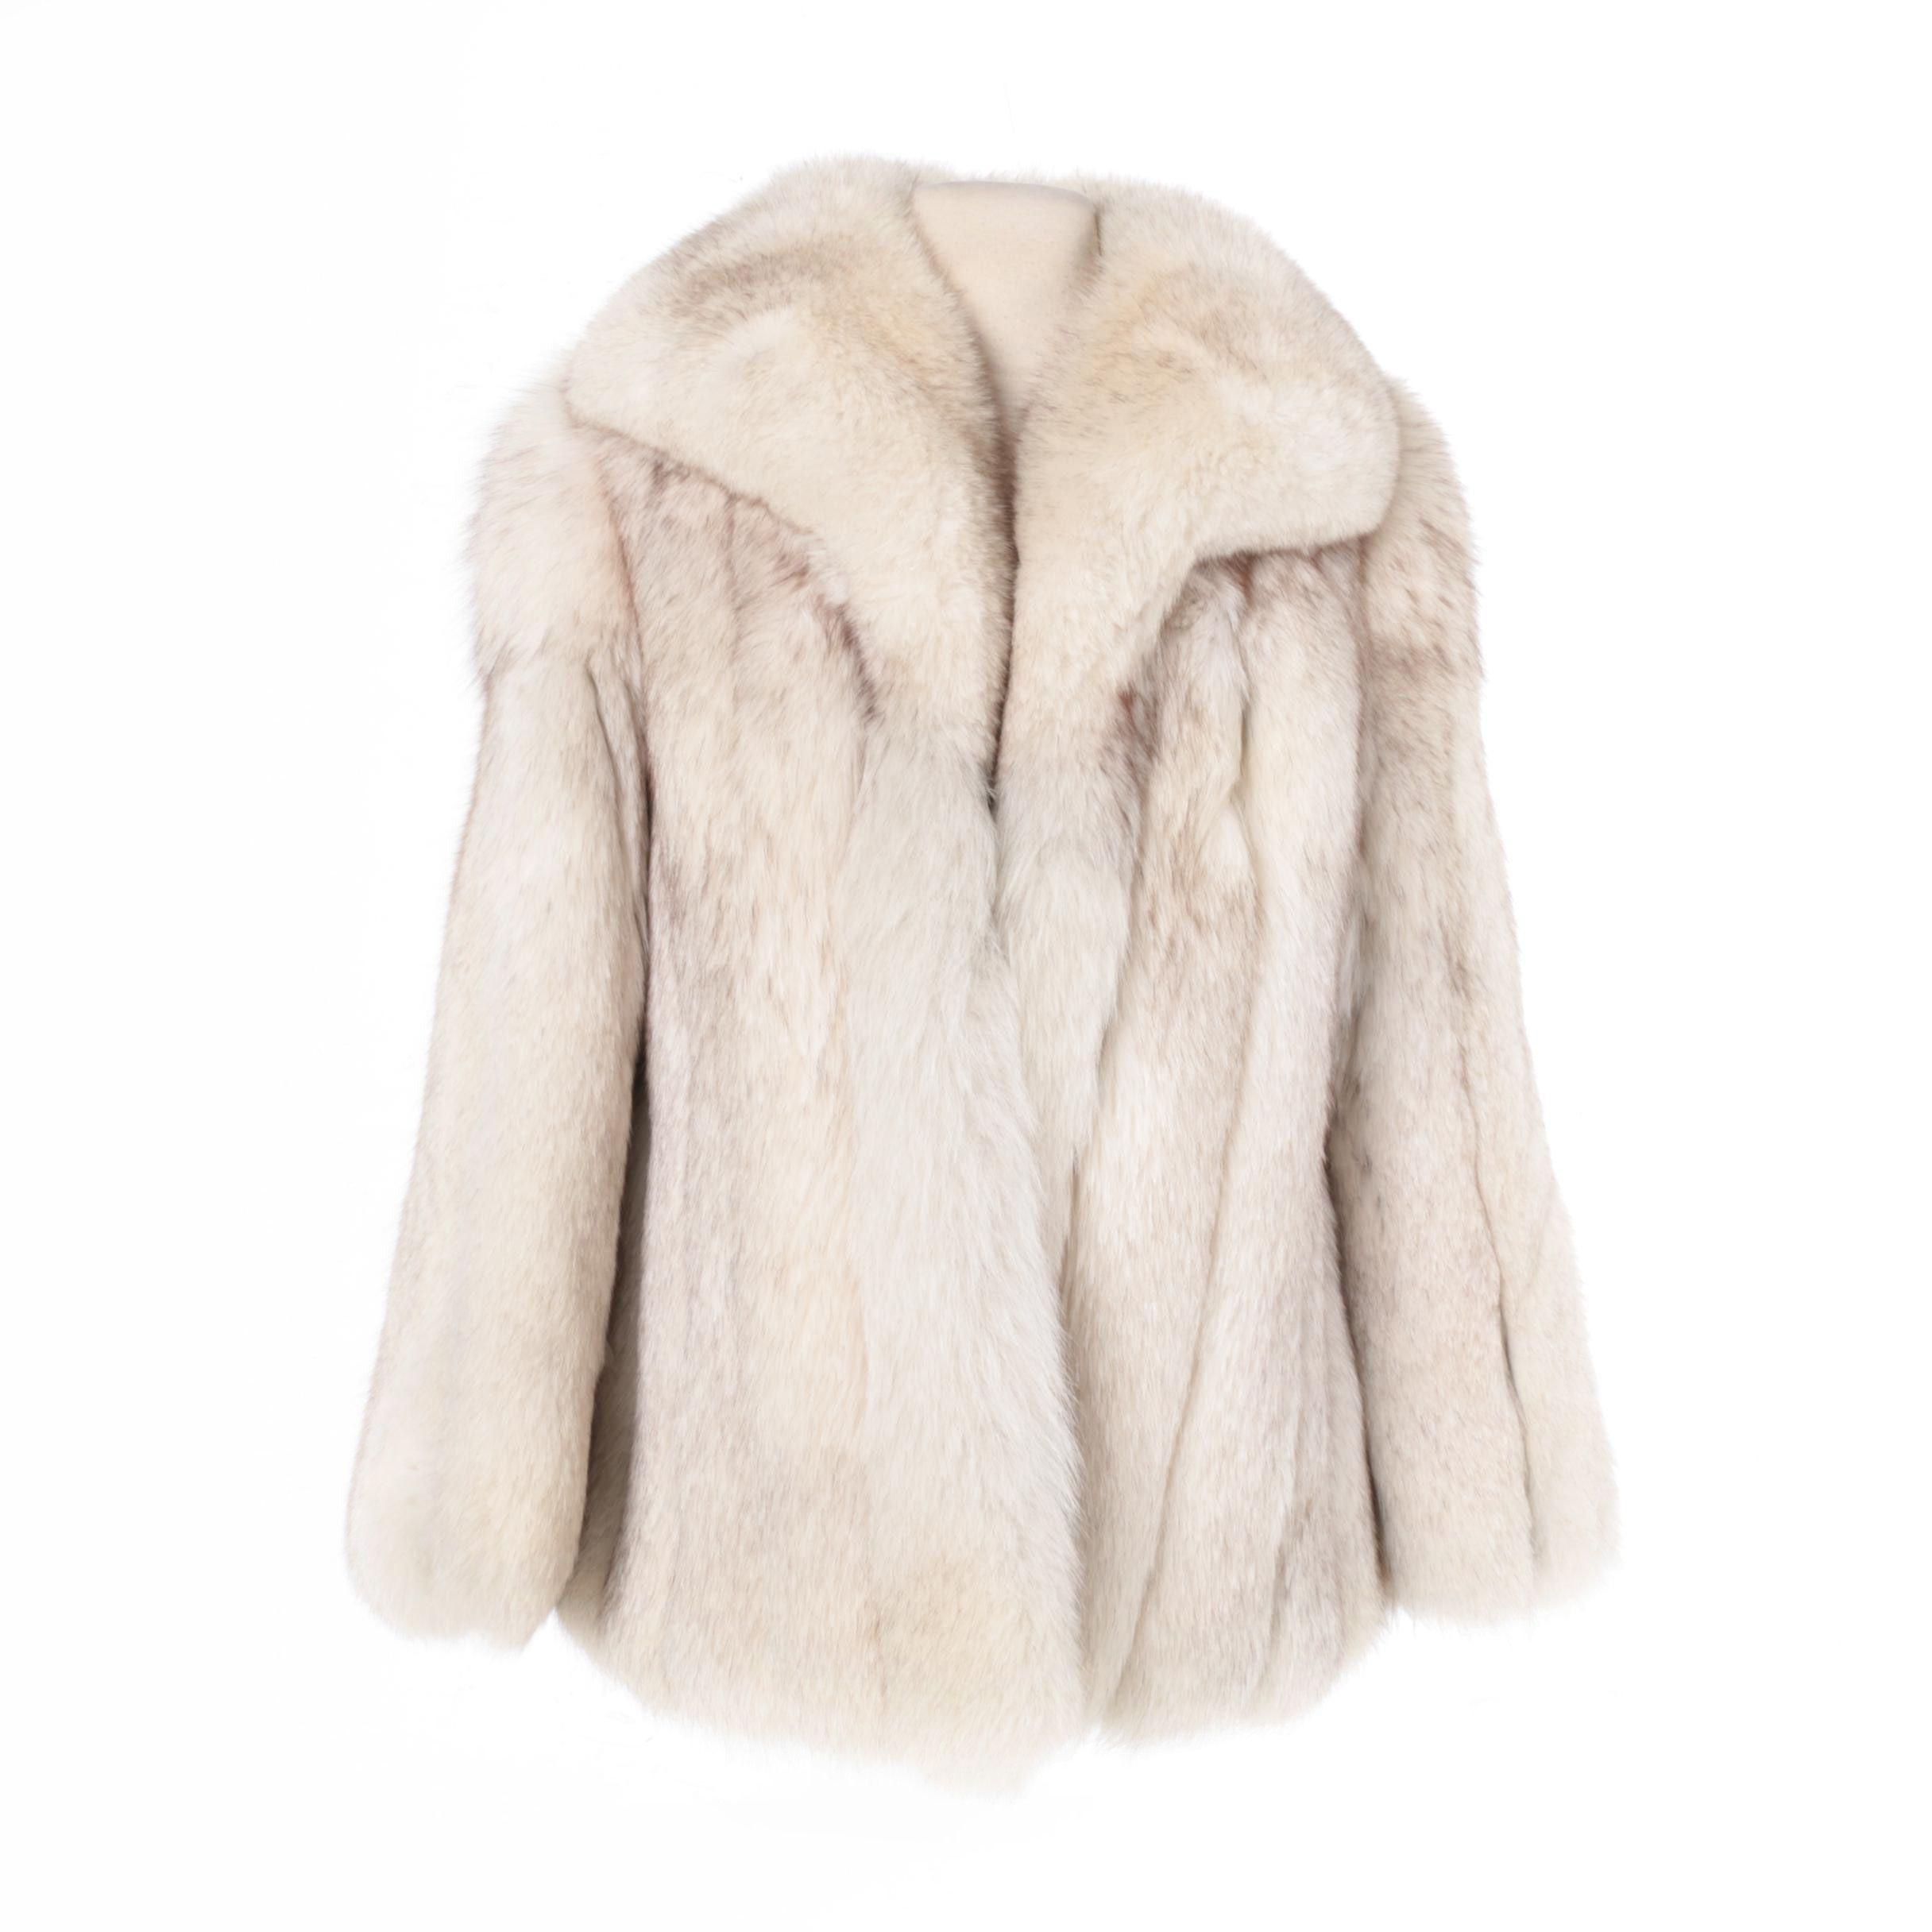 Women's Embroy's Blue Fox Fur Coat